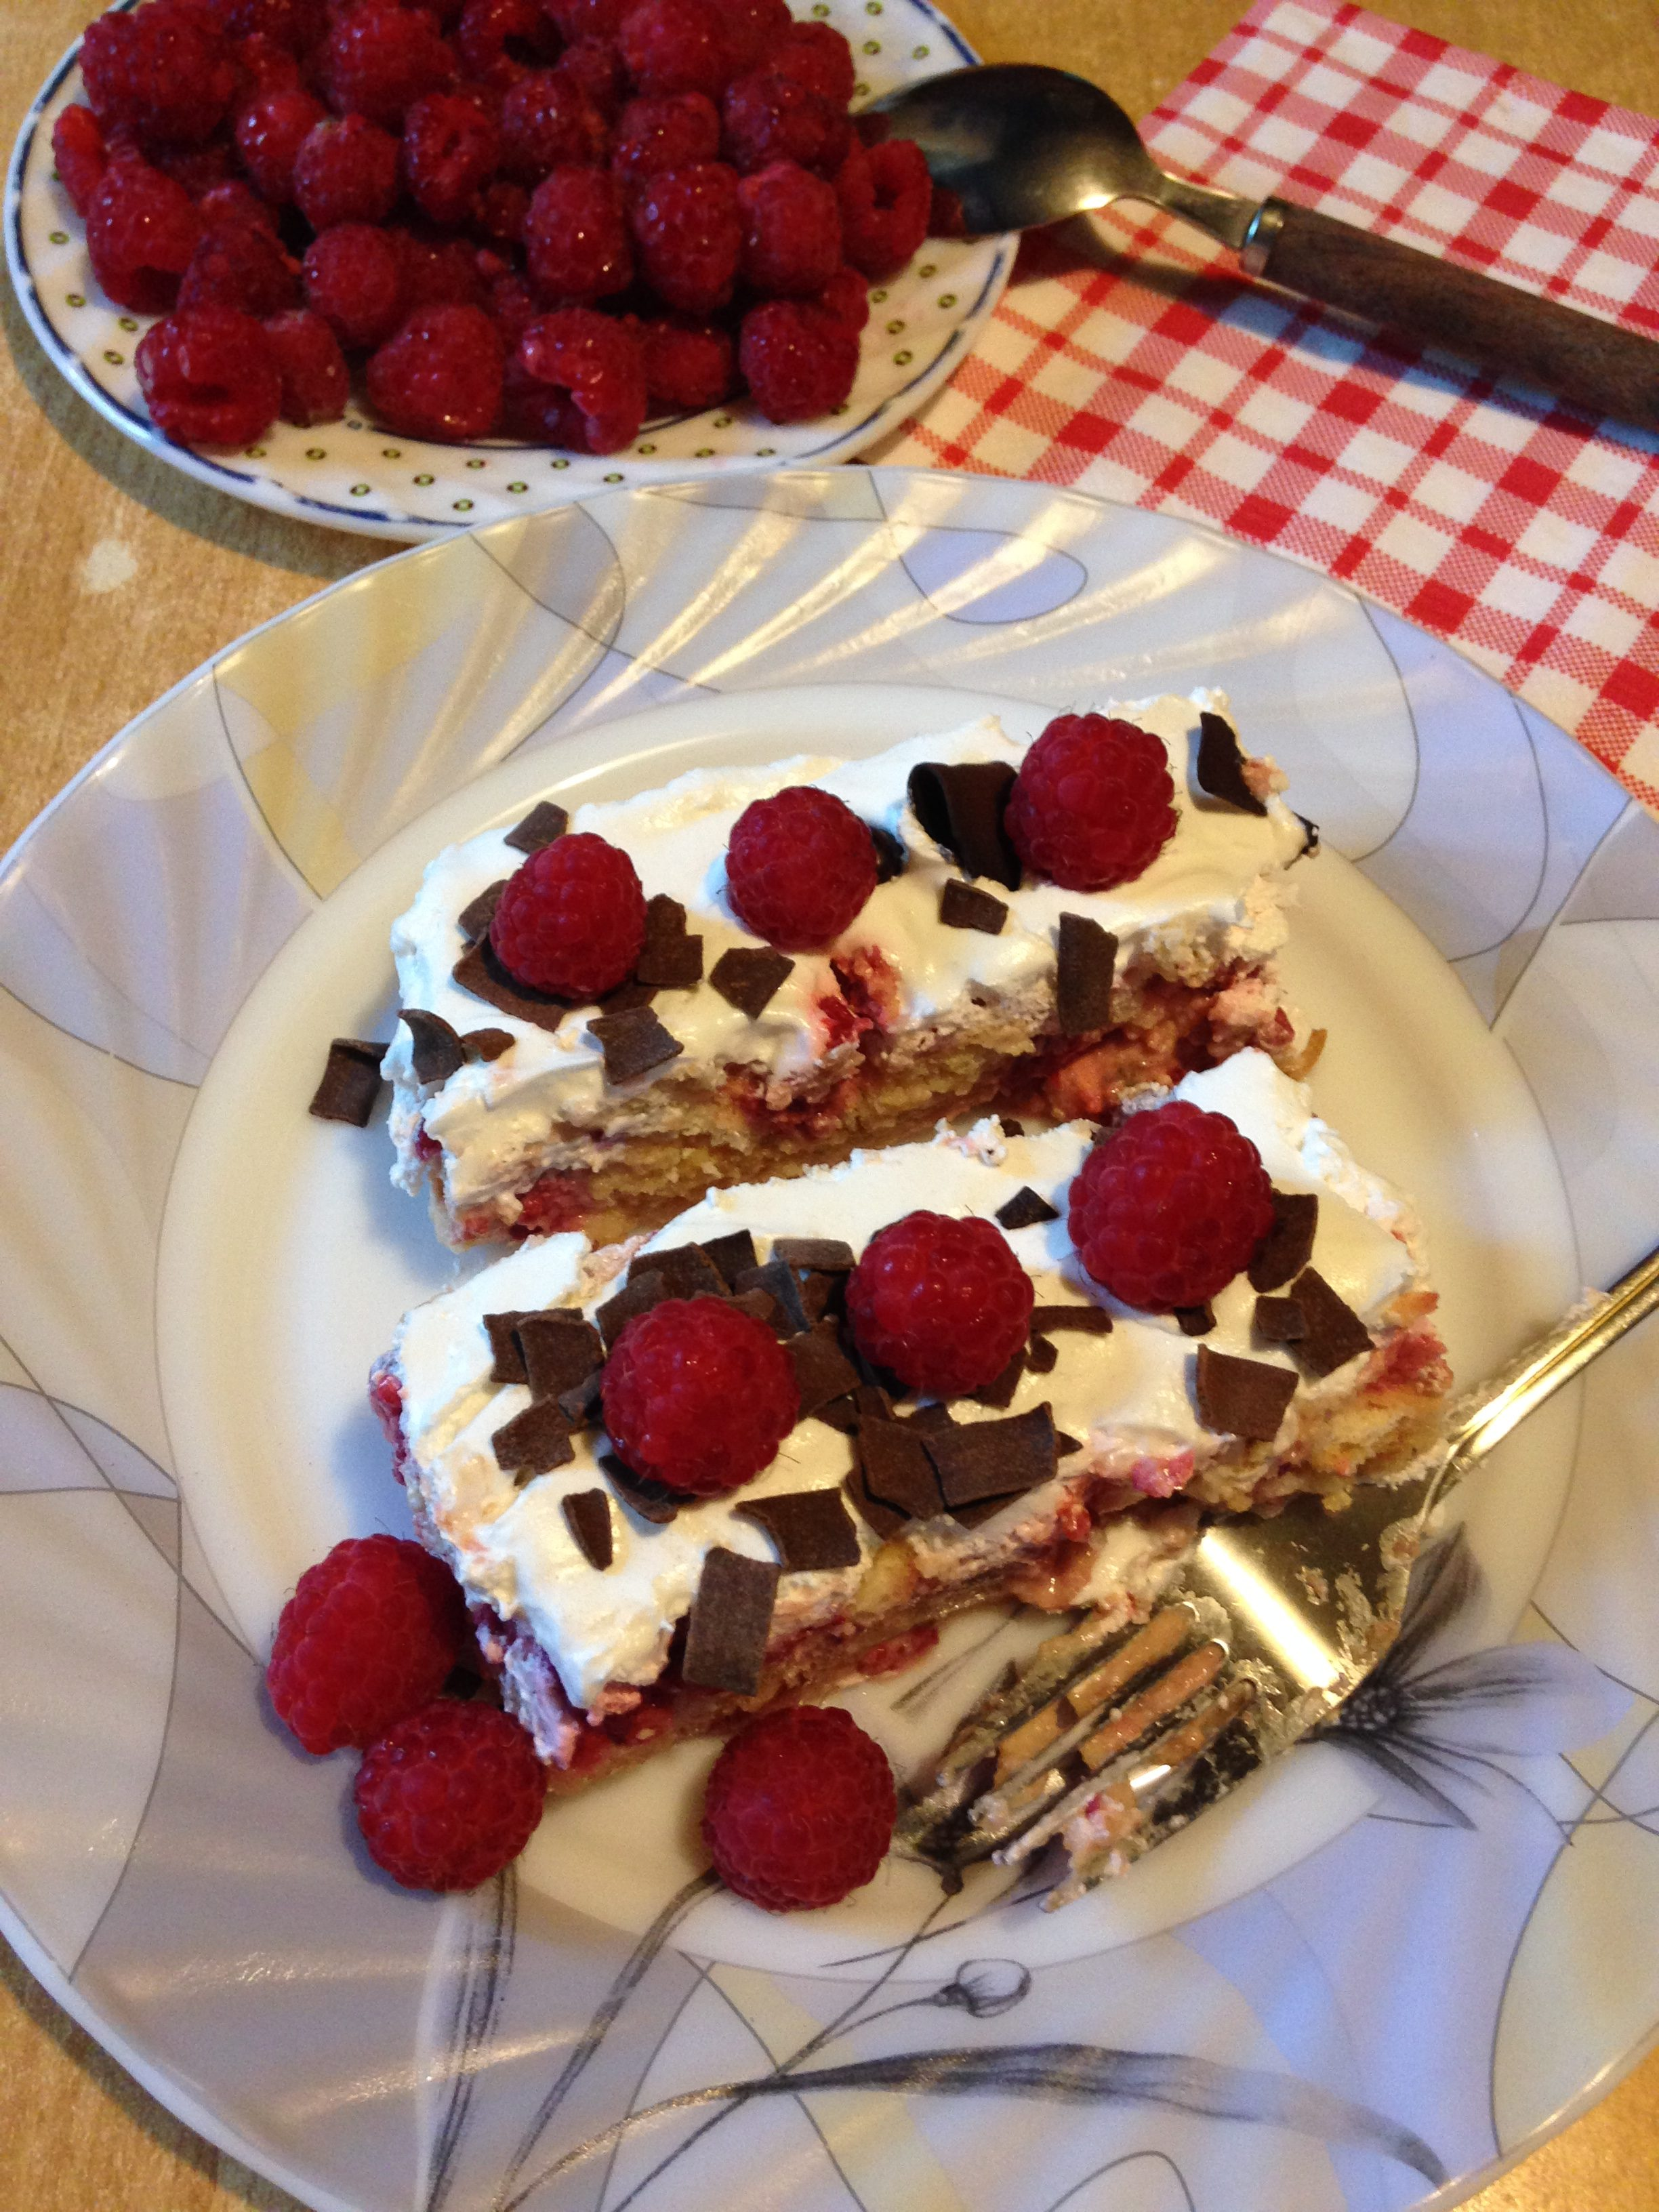 Laka i brza torta sa malinama i keksom